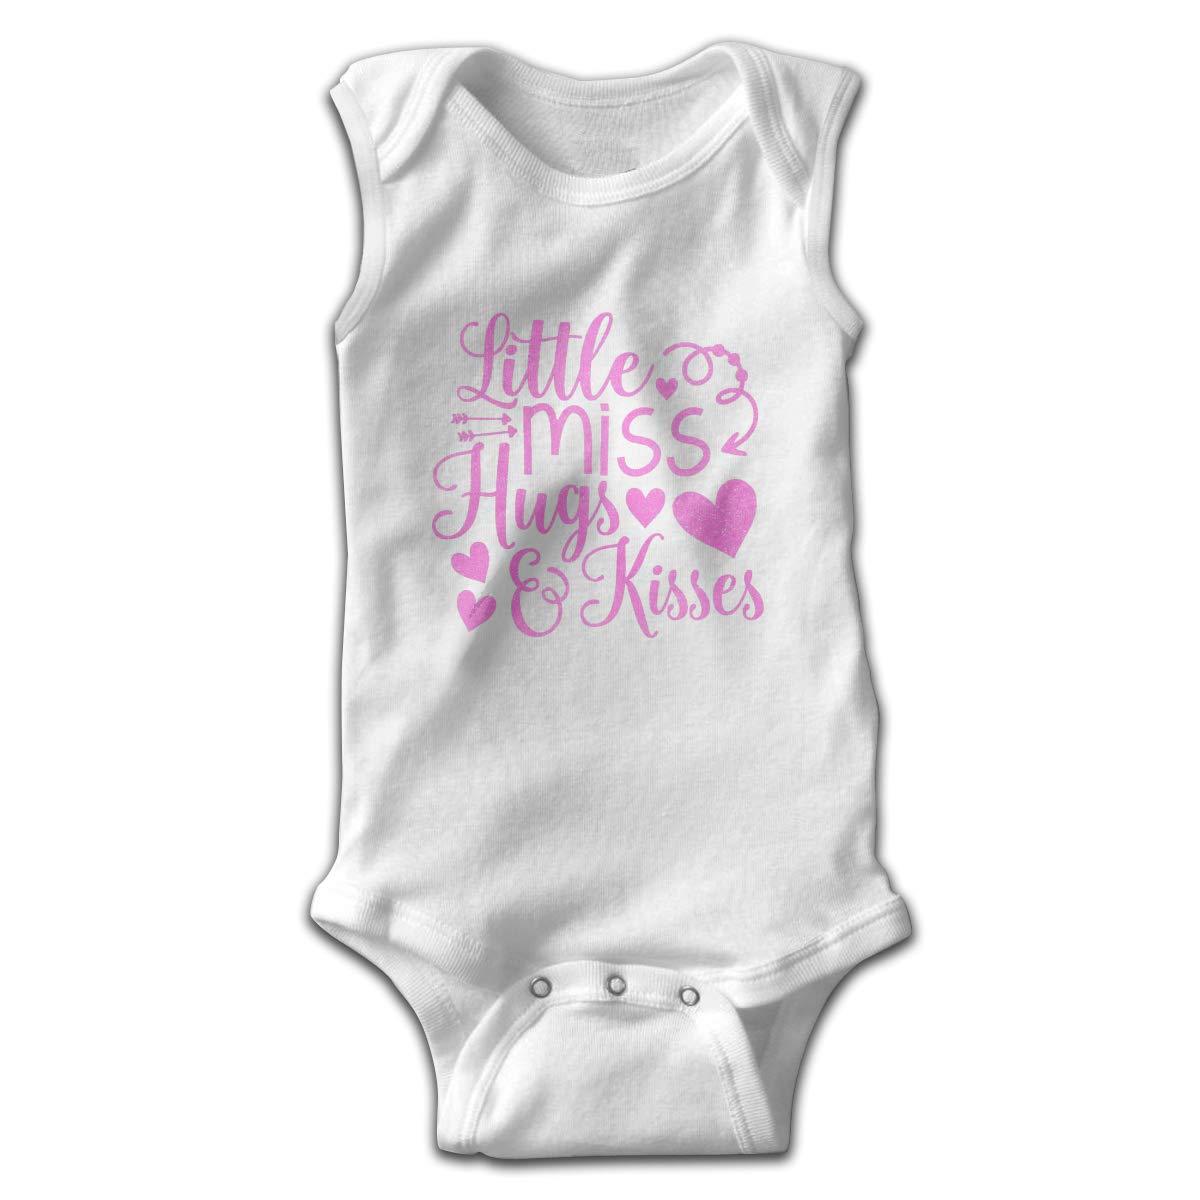 Toddler Baby Girls Rompers Sleeveless Cotton Onesie,Little Miss Hugs and Kisses Bodysuit Autumn Pajamas